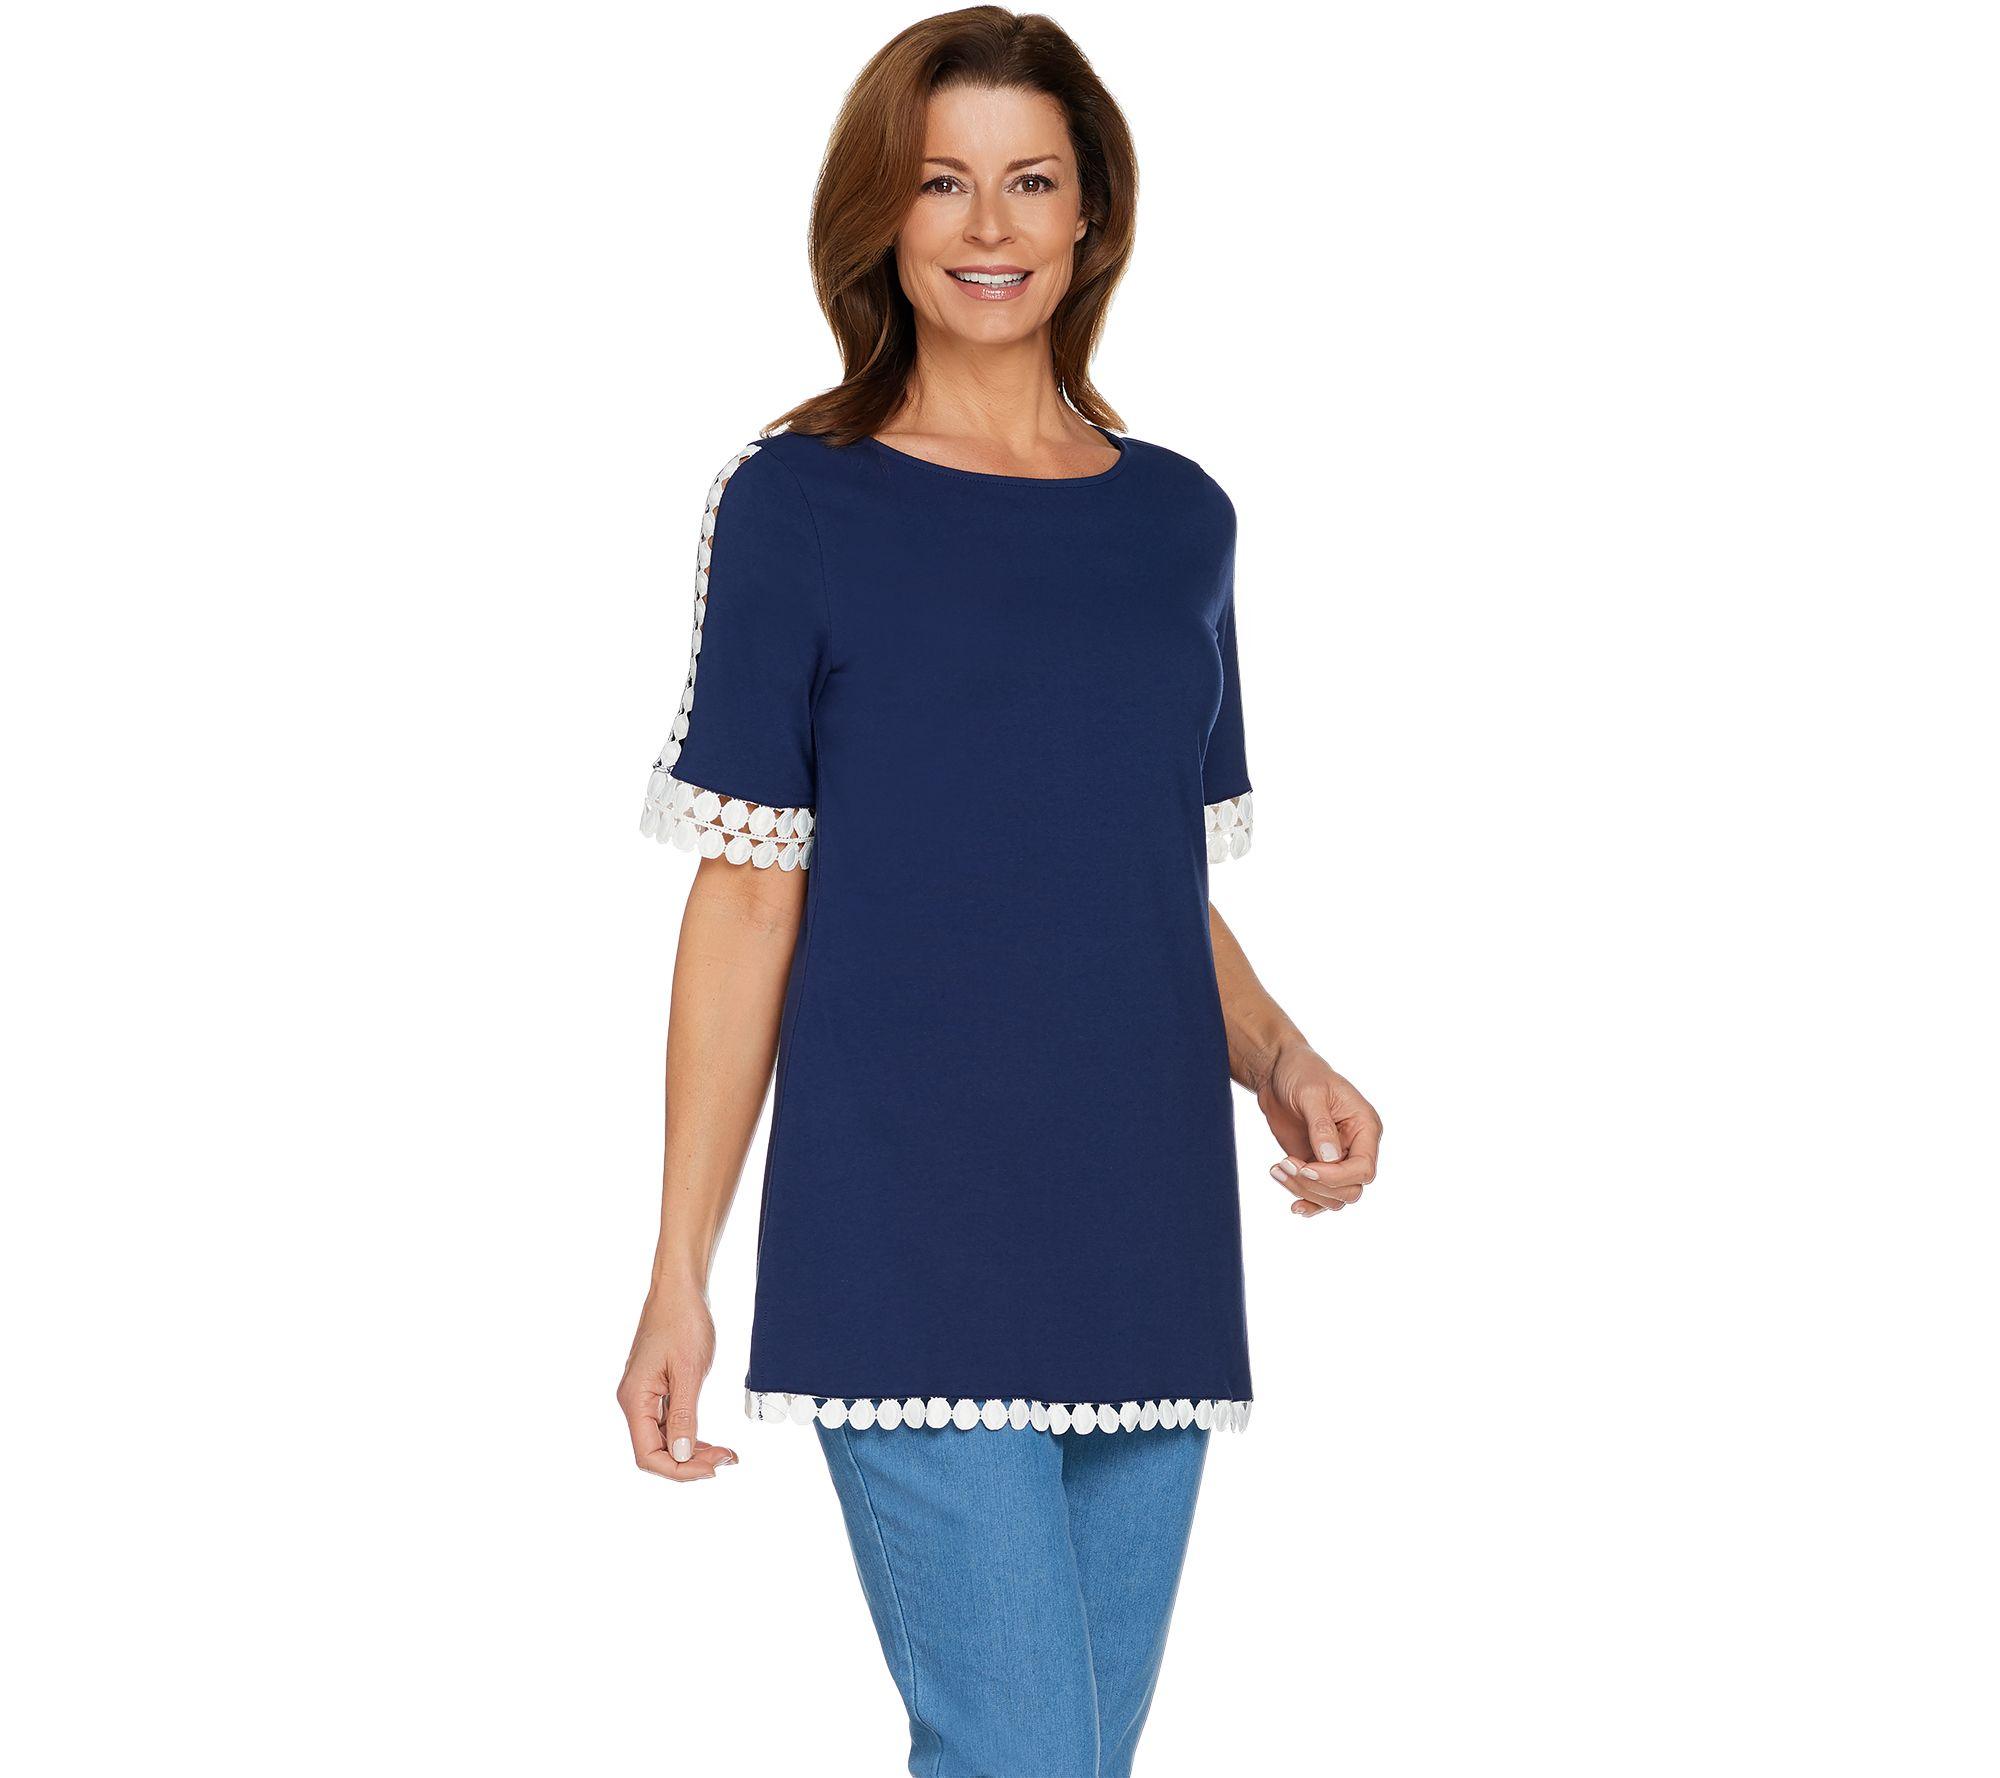 Denim & Co. — Blouses & Tops — Fashion — QVC.com